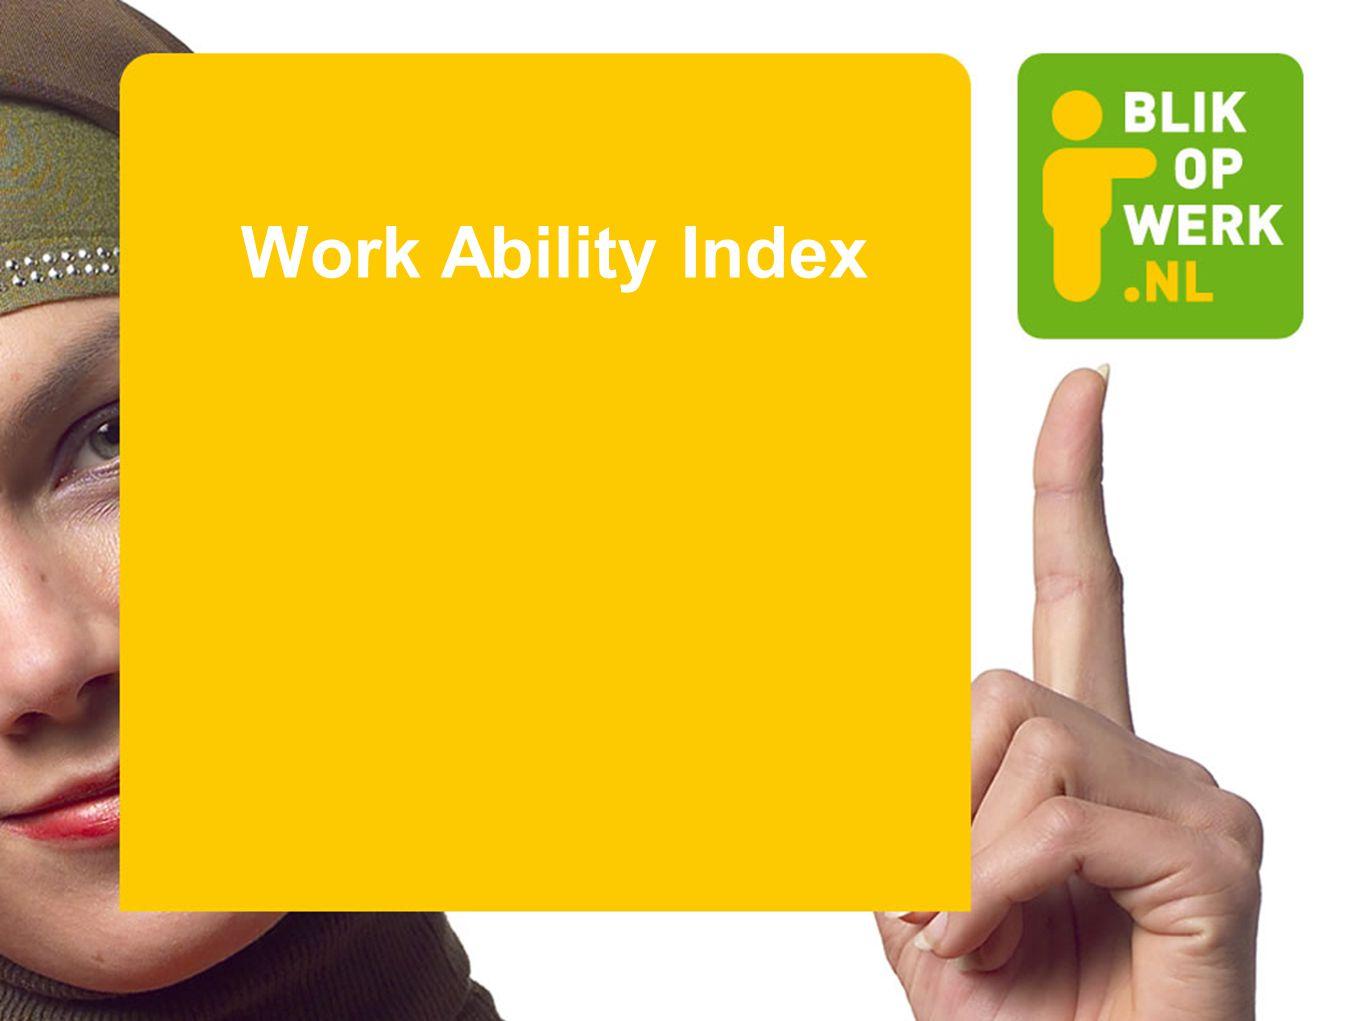 Work Ability Index